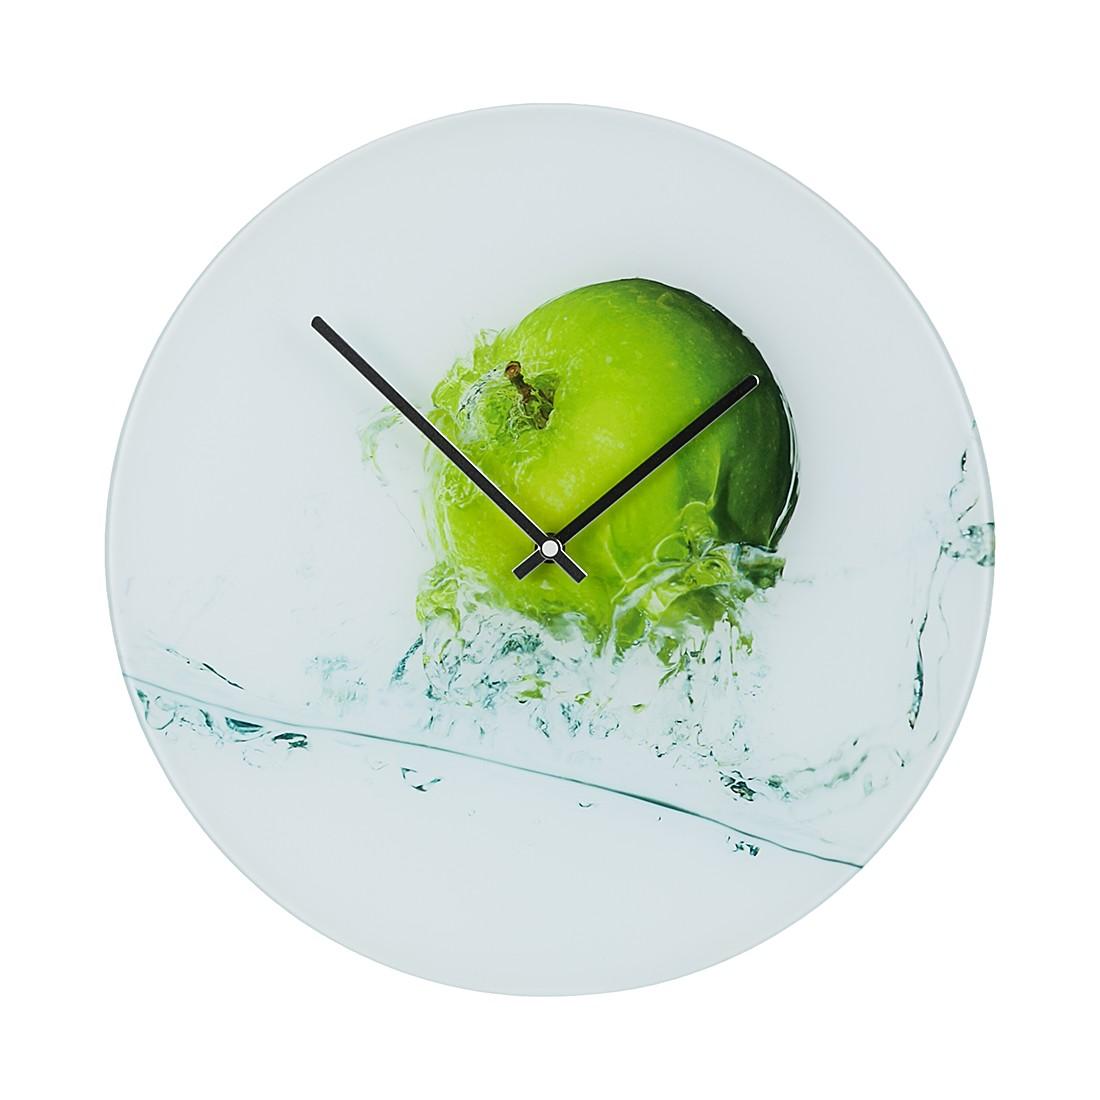 Image of Orologio Apple, Pro Art